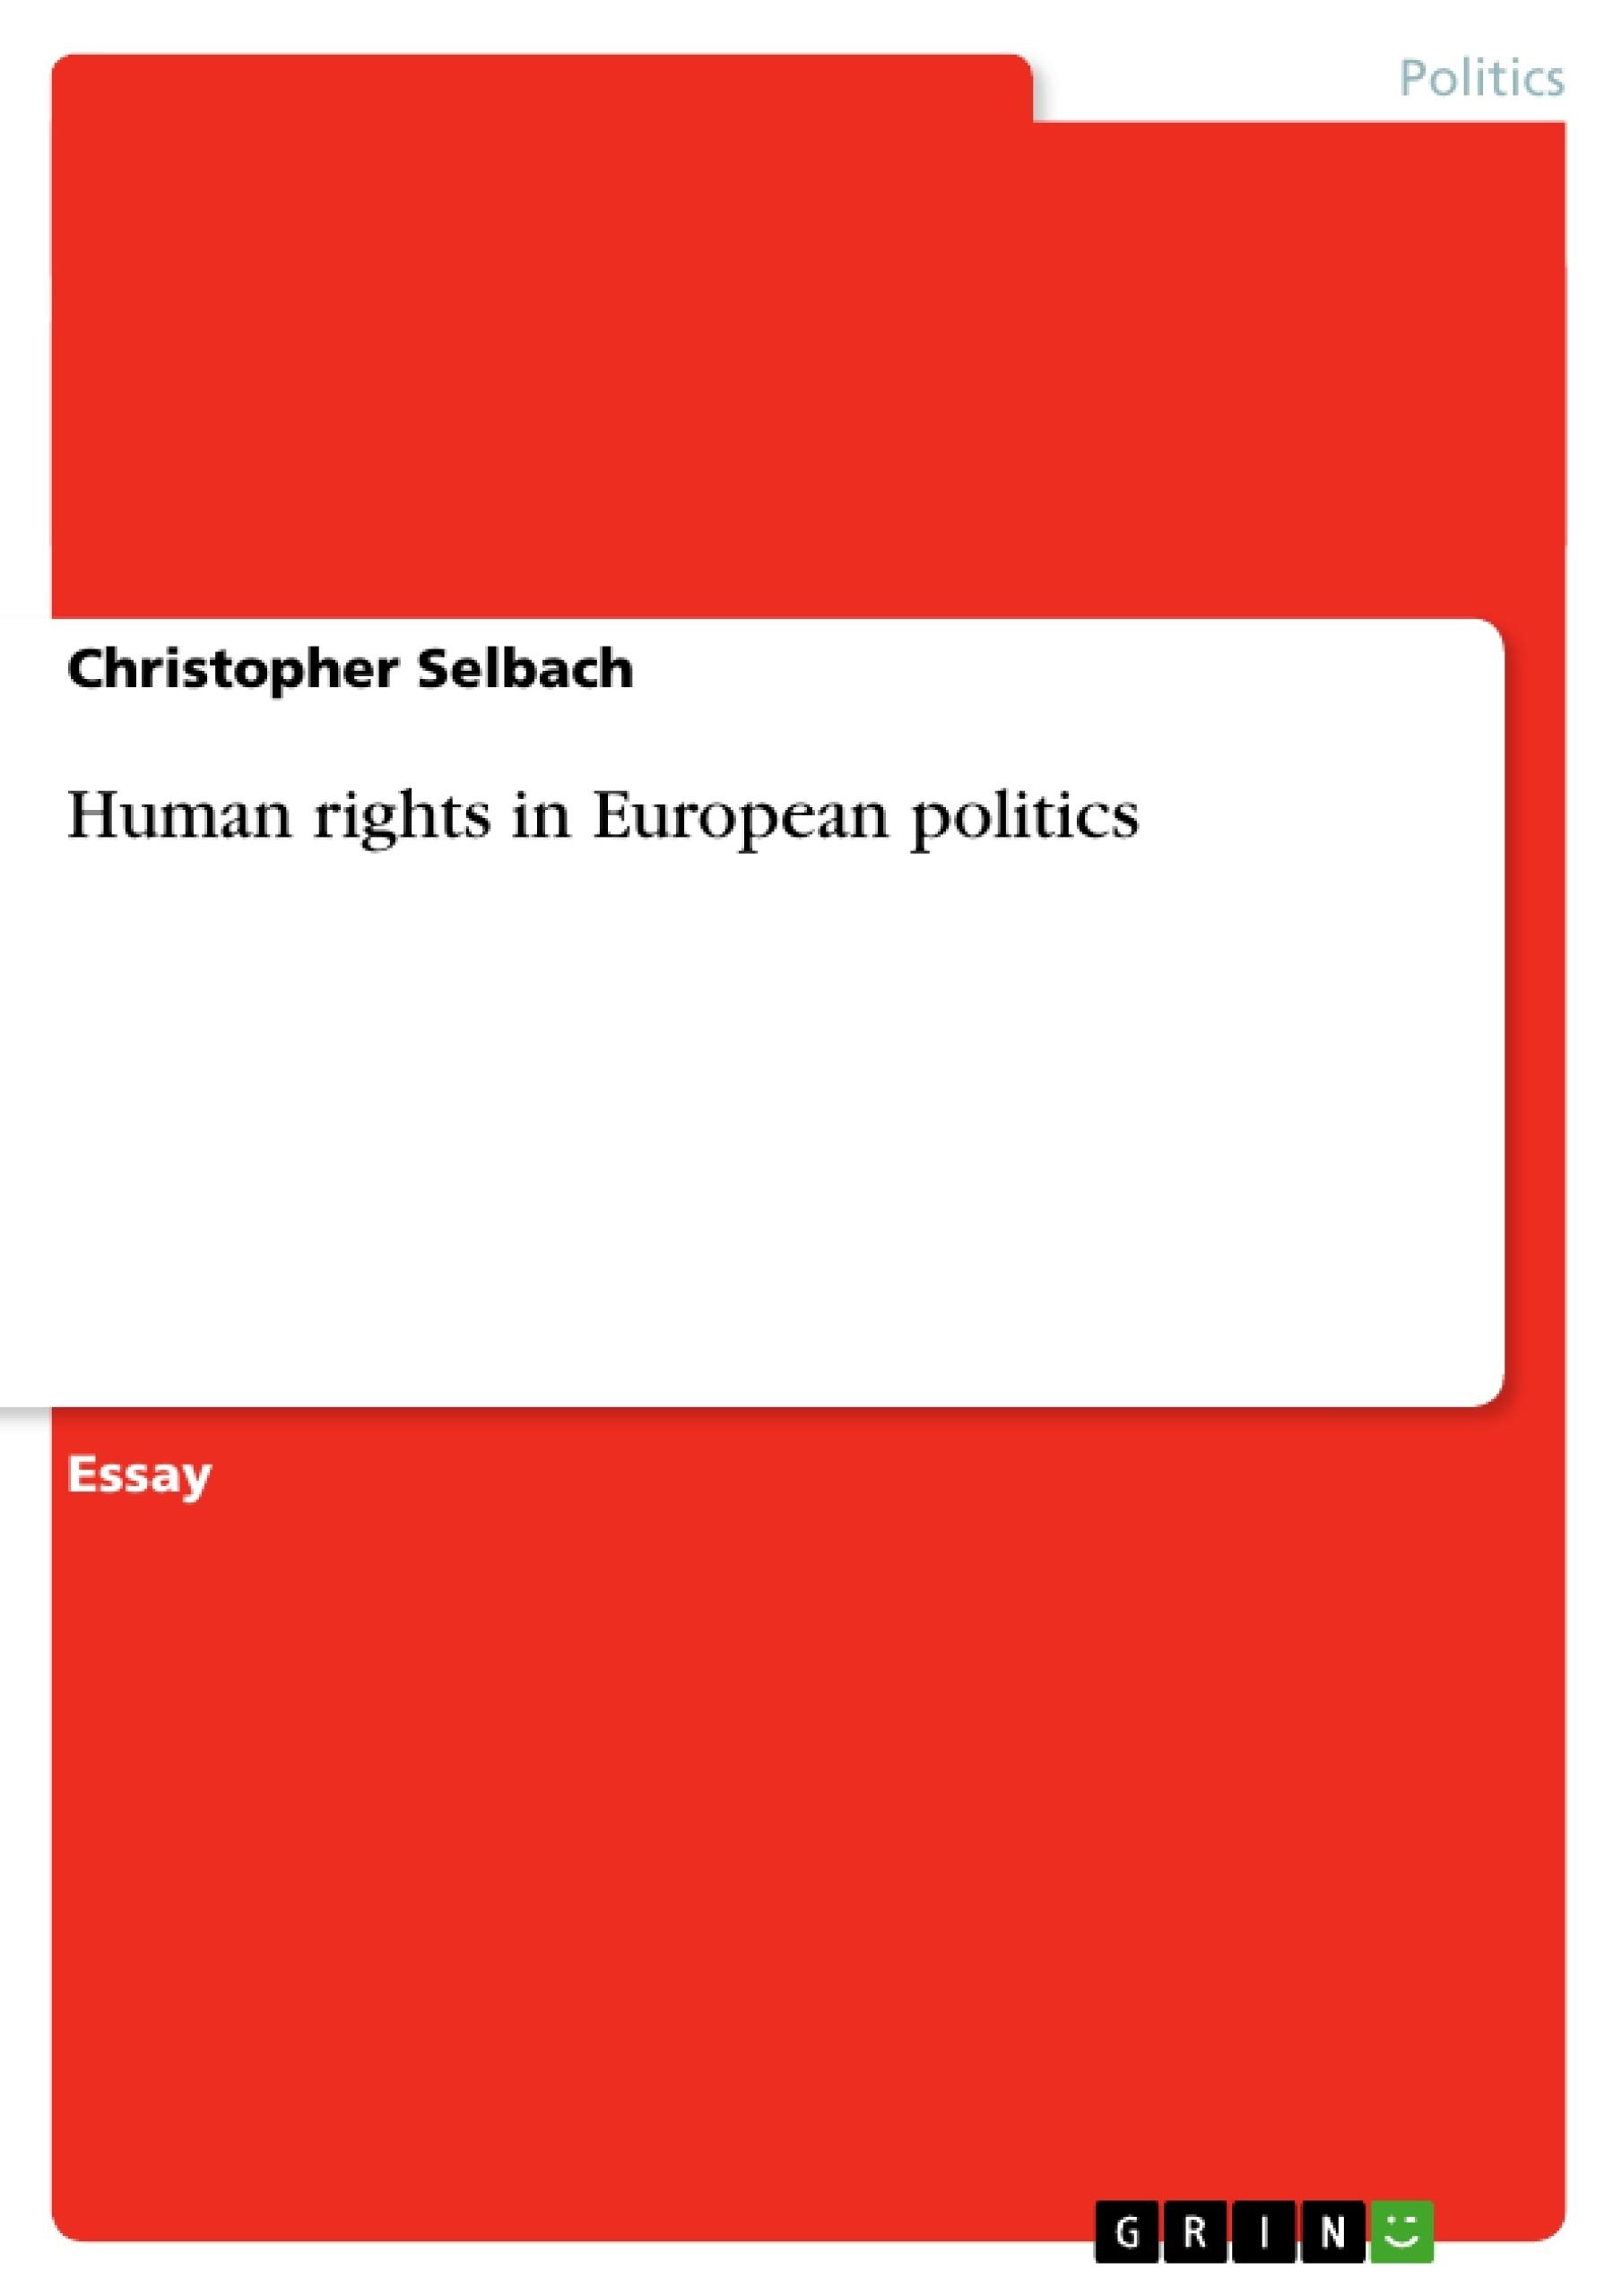 Title: Human rights in European politics